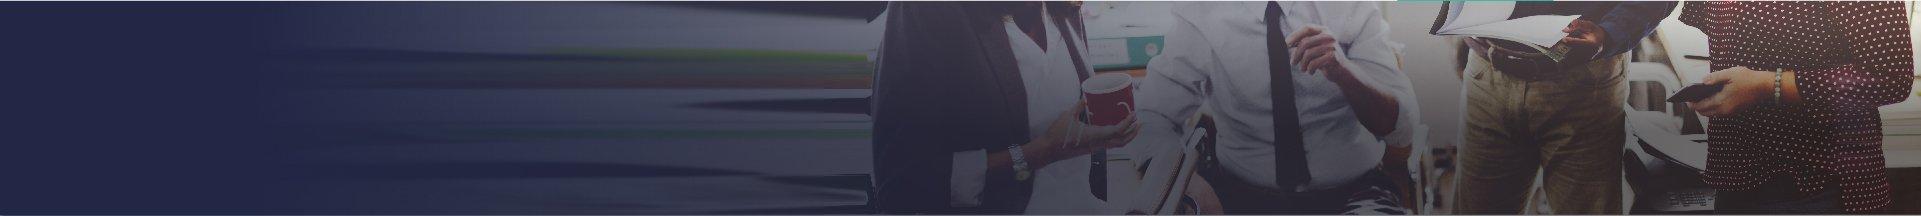 Business-Driven Talent Development Solutions